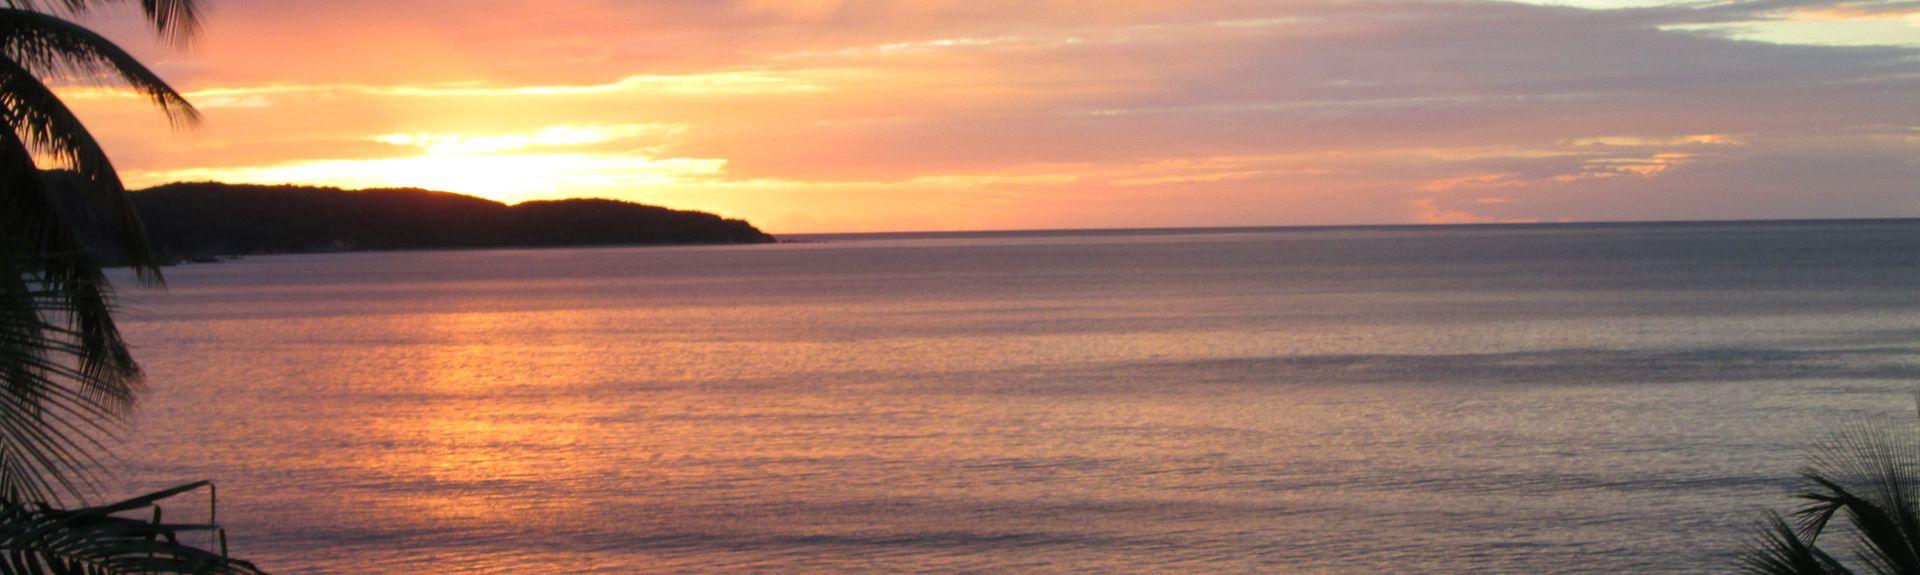 Bolongo Bay, Estate Frenchman Bay, St. Thomas, Ilhas Virgens E.U.A.